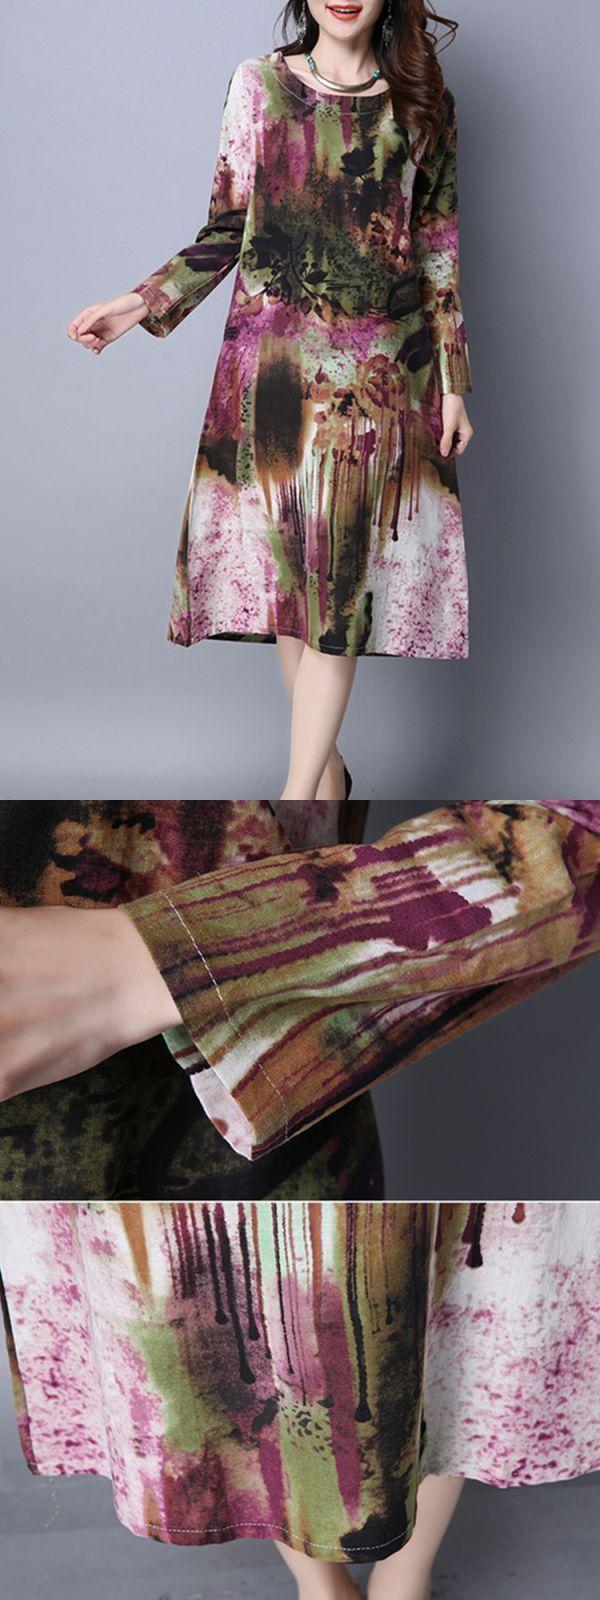 Casual dress code women vintage pocket printed dresses long sleeve o